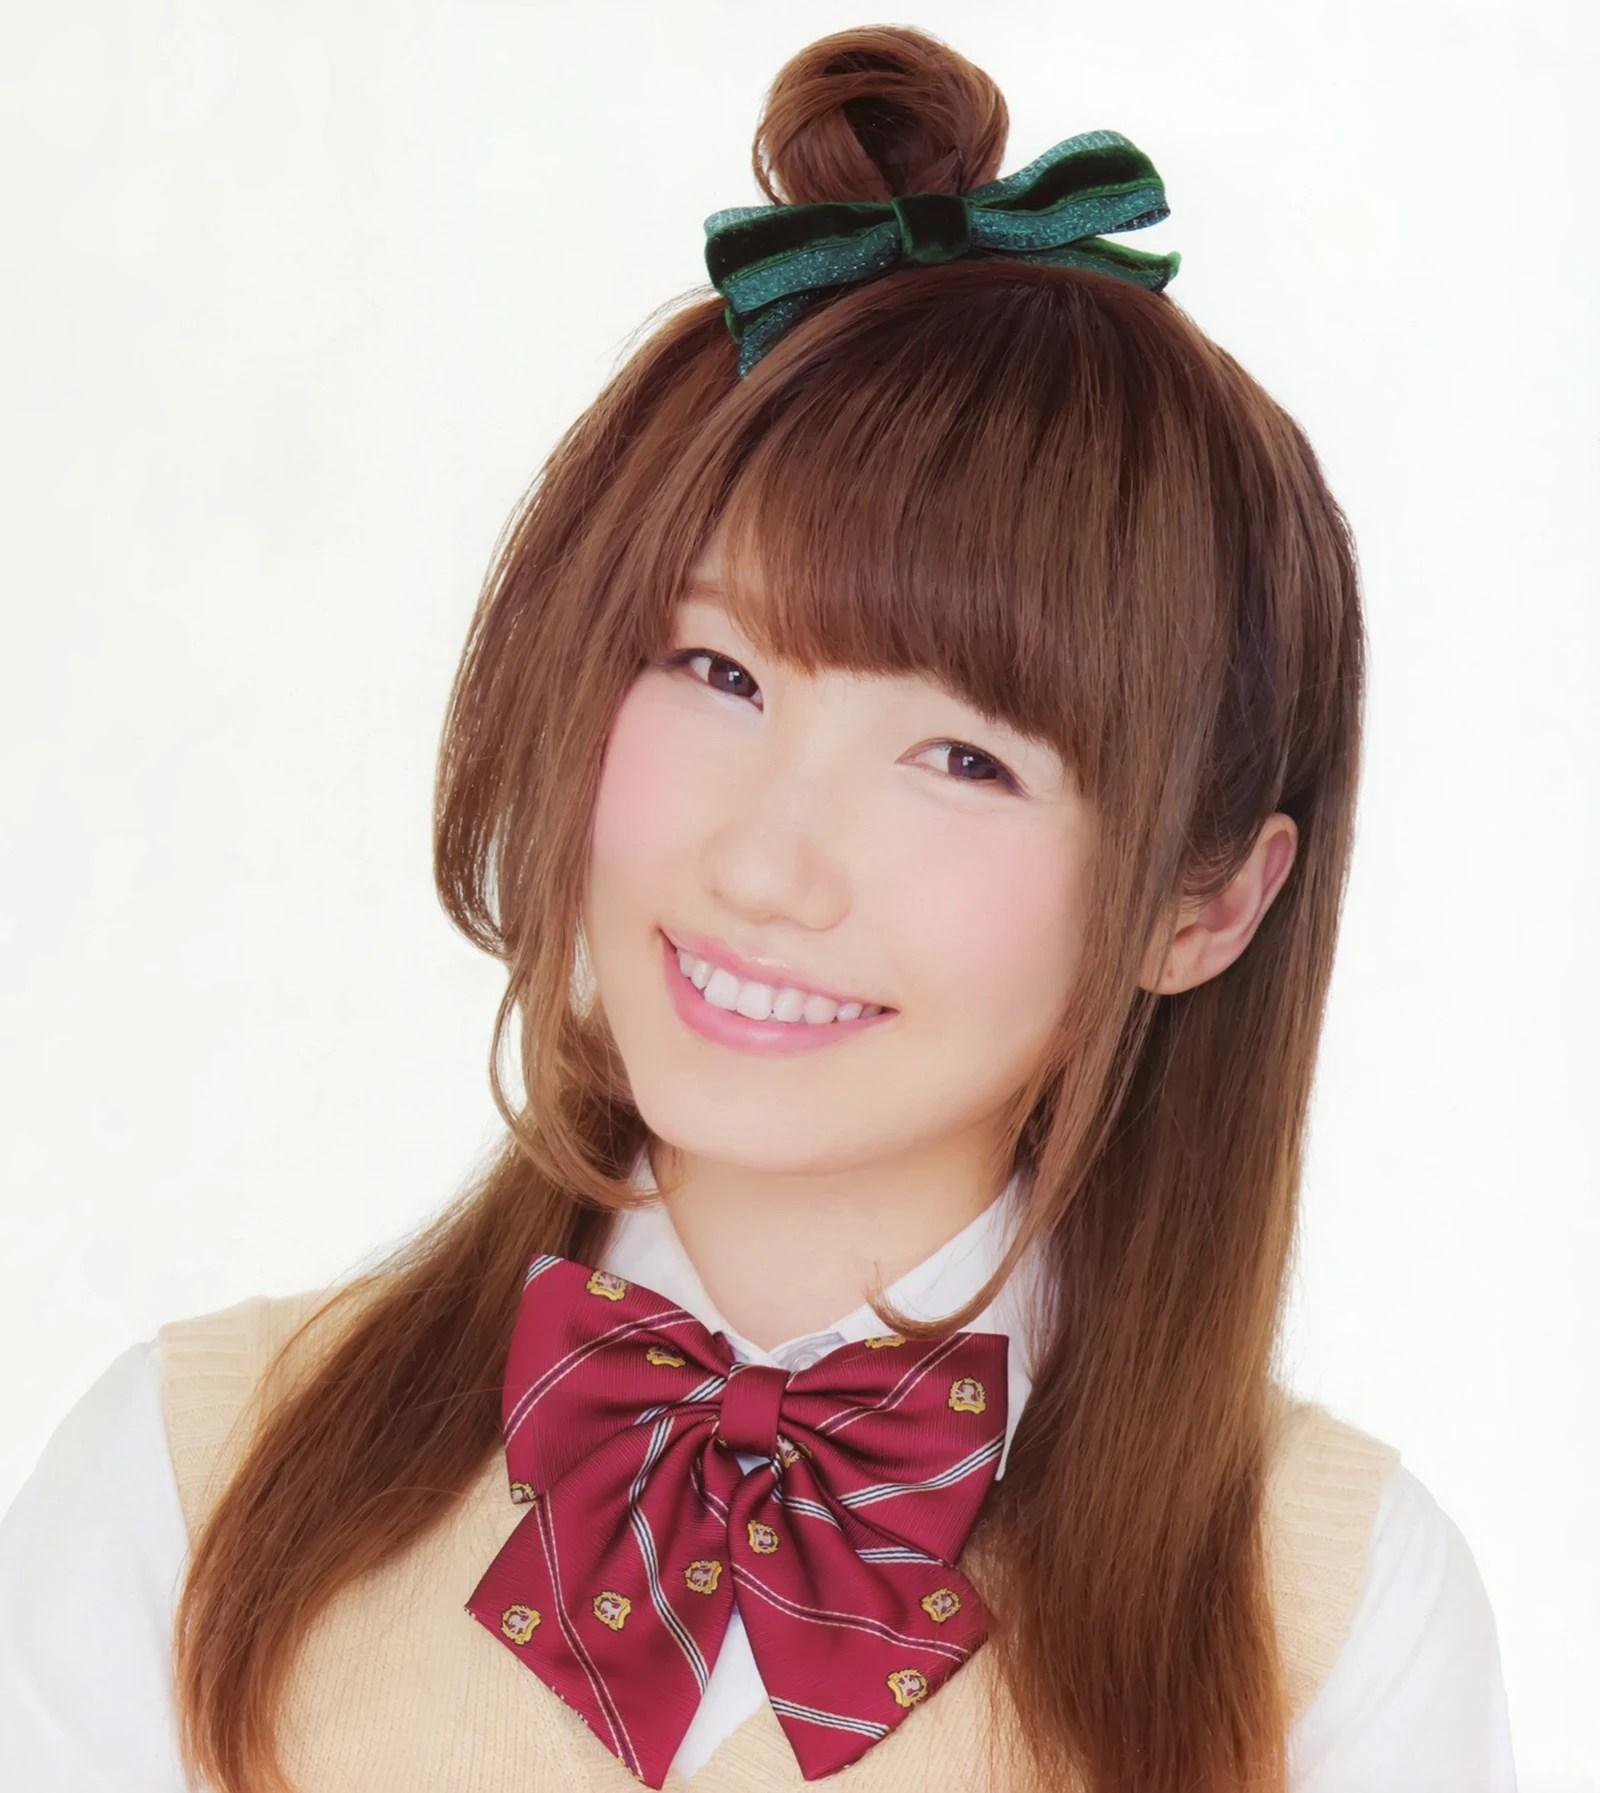 Eli Ayase Cute Wallpaper Aya Uchida Love Live Wiki Fandom Powered By Wikia